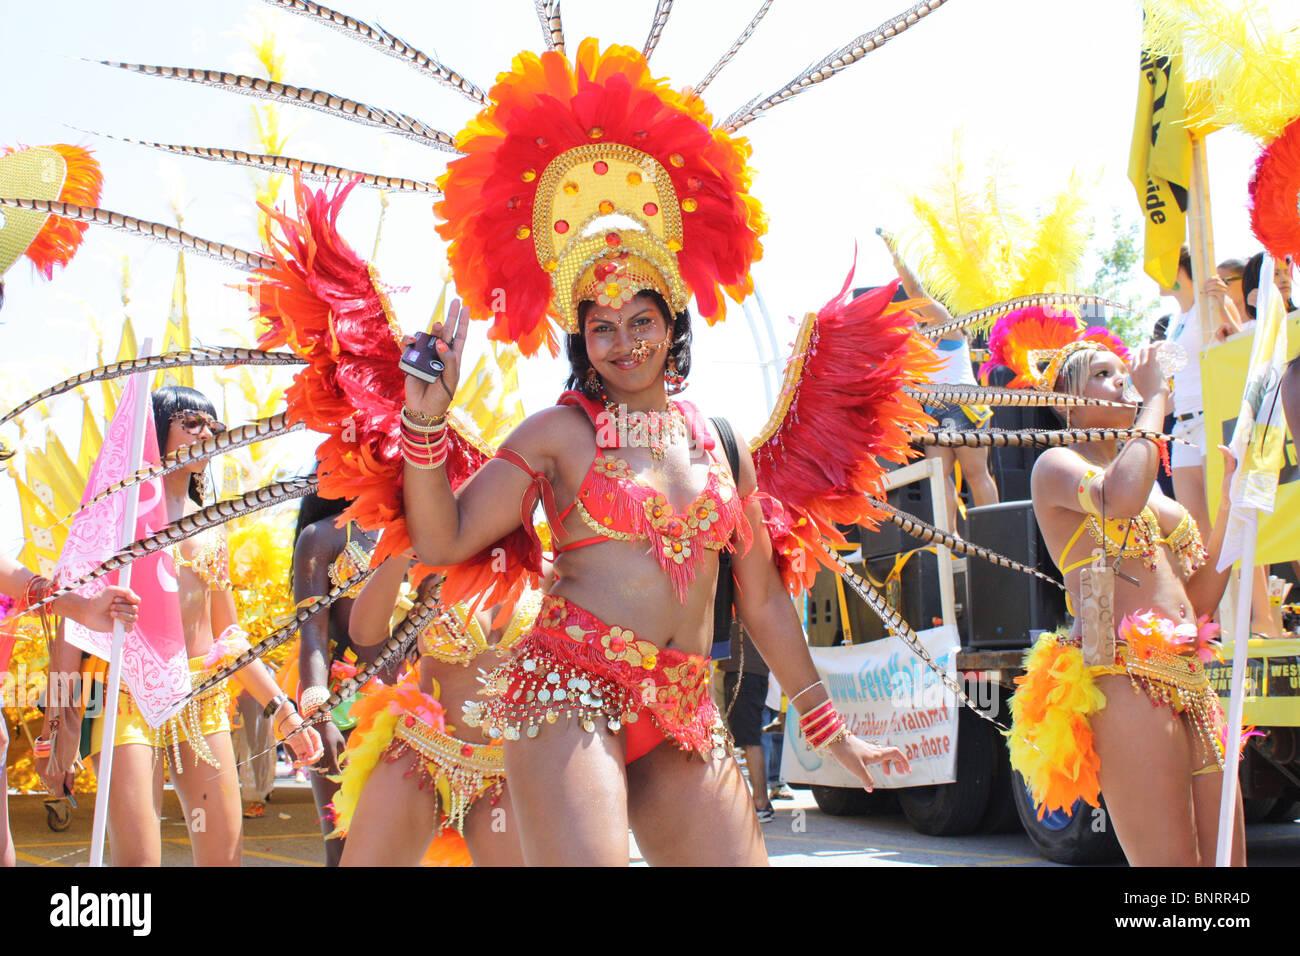 costumed black woman dancing outdoor festival - Stock Image